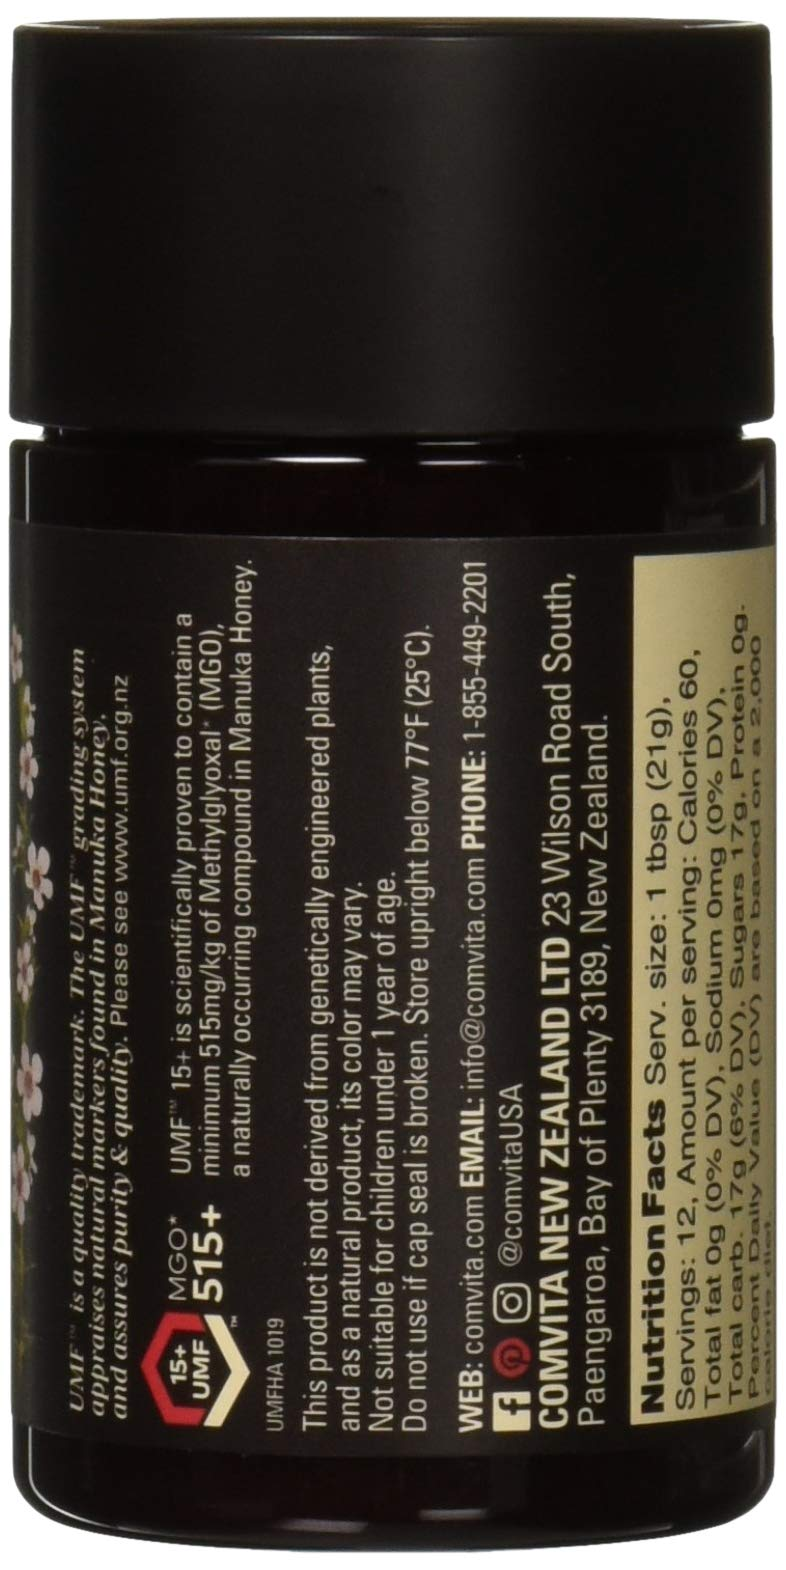 Comvita UMF 15+ (MGO 514+) Raw Manuka Honey | 8.8 oz I New Zealand's #1 Manuka Brand | Wild, Non-GMO I Super Premium Grade by Comvita (Image #3)